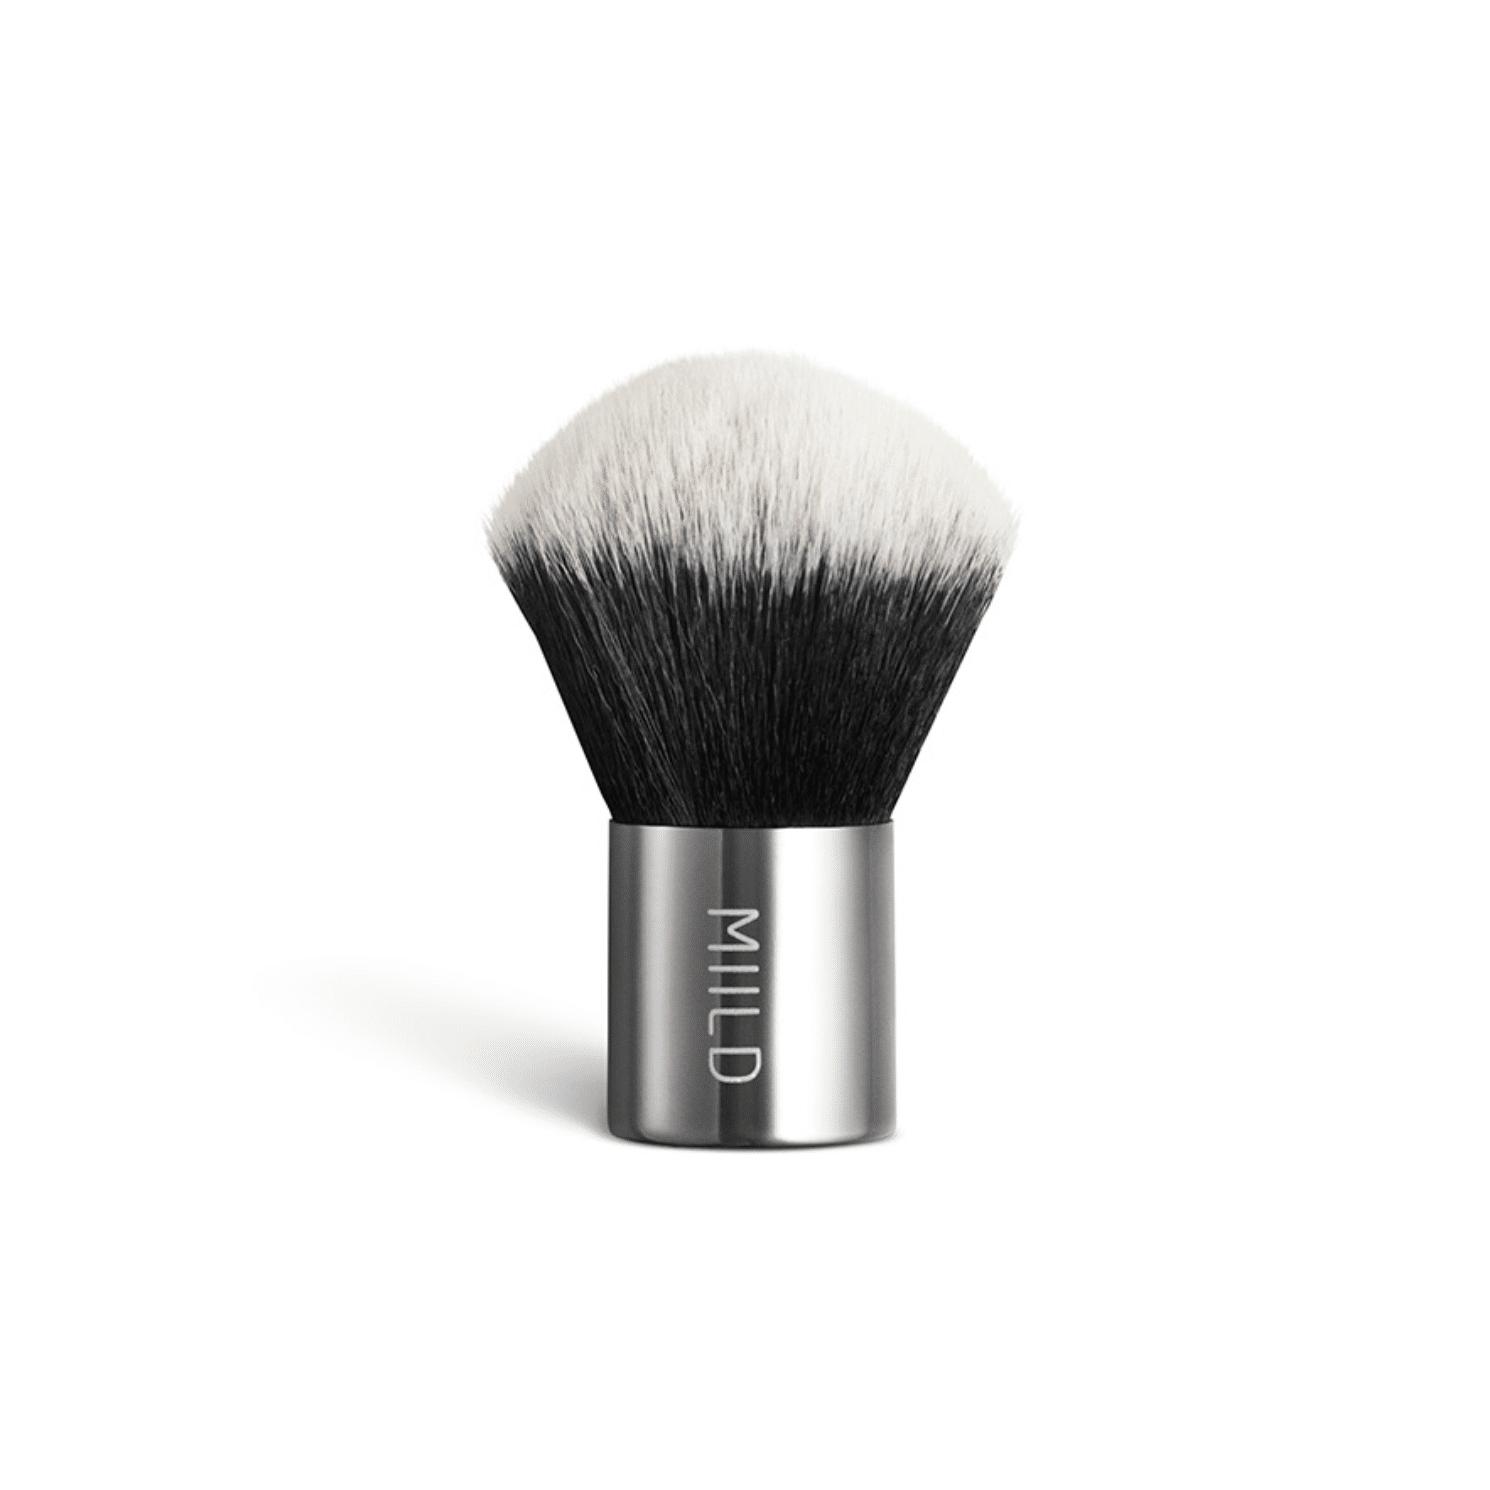 Miild 01 Kabuki Brush